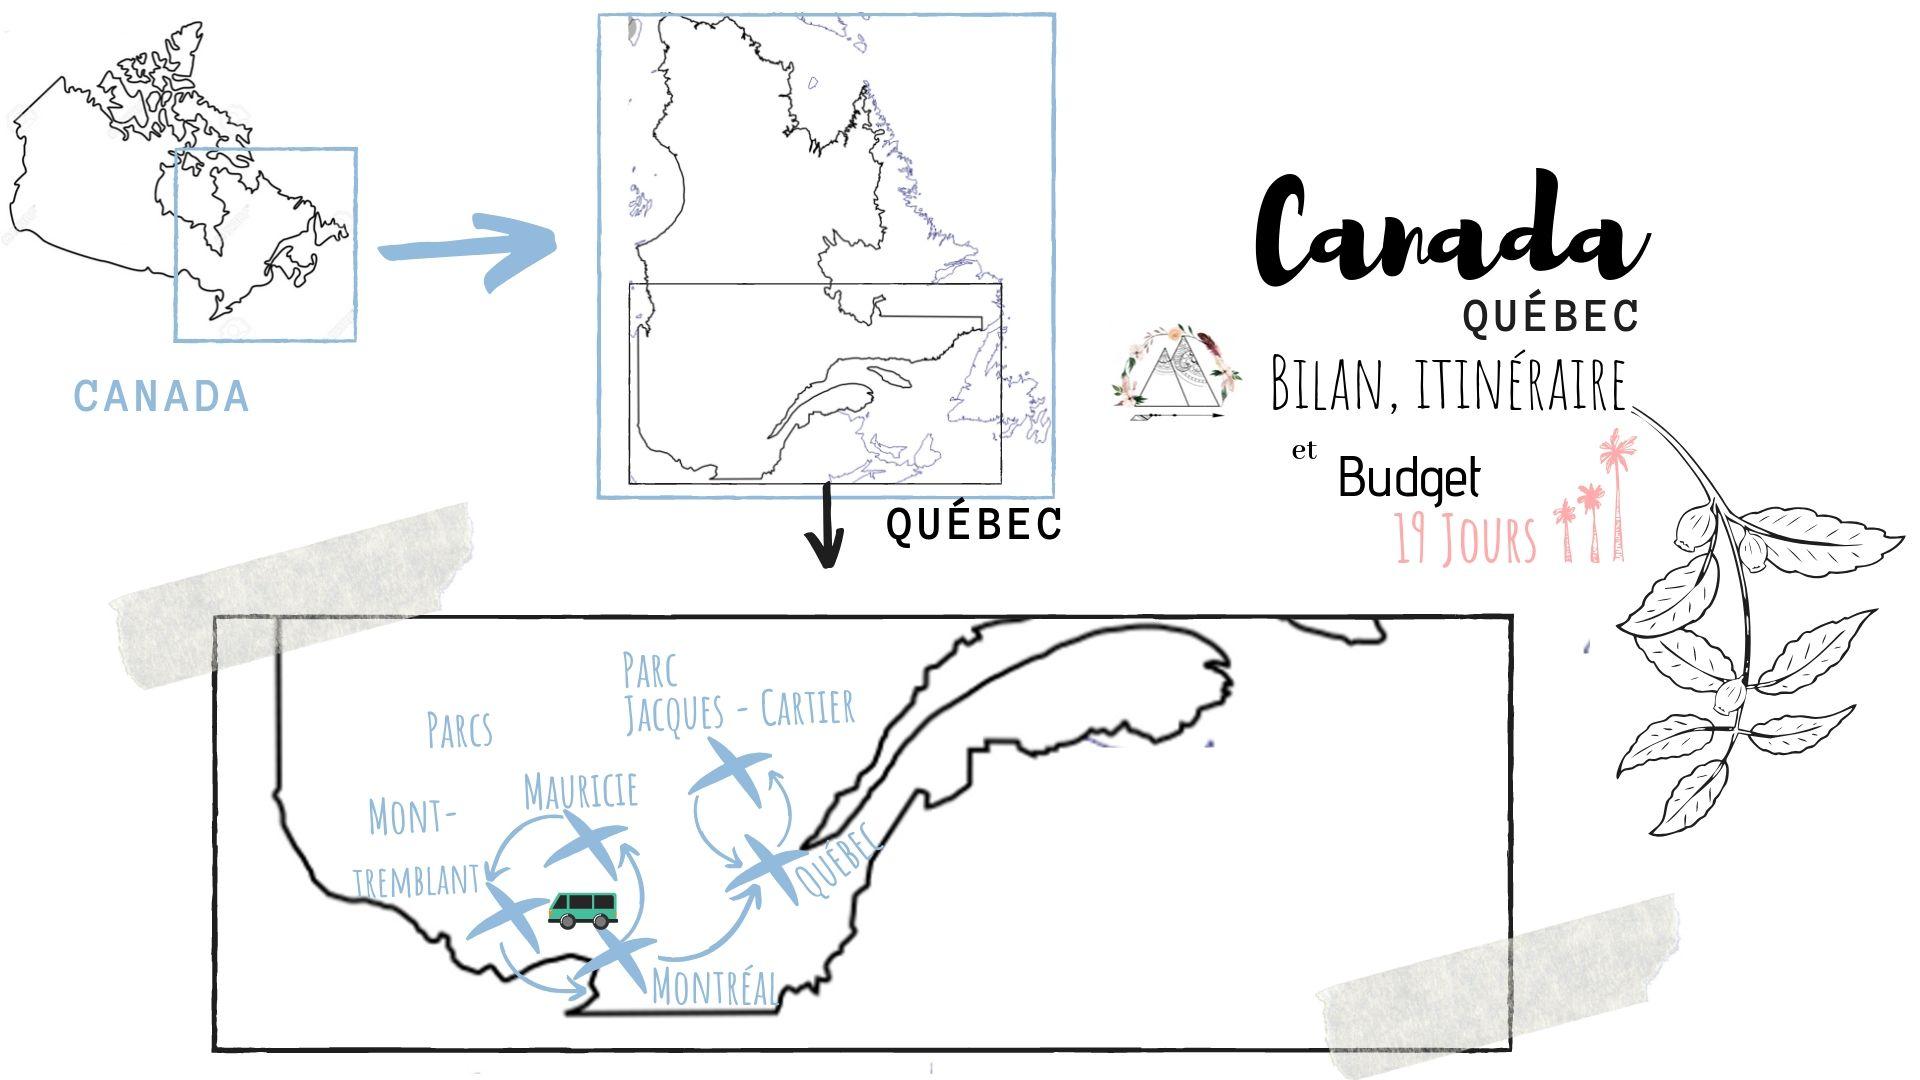 itinéraire budget road trip quebec blog